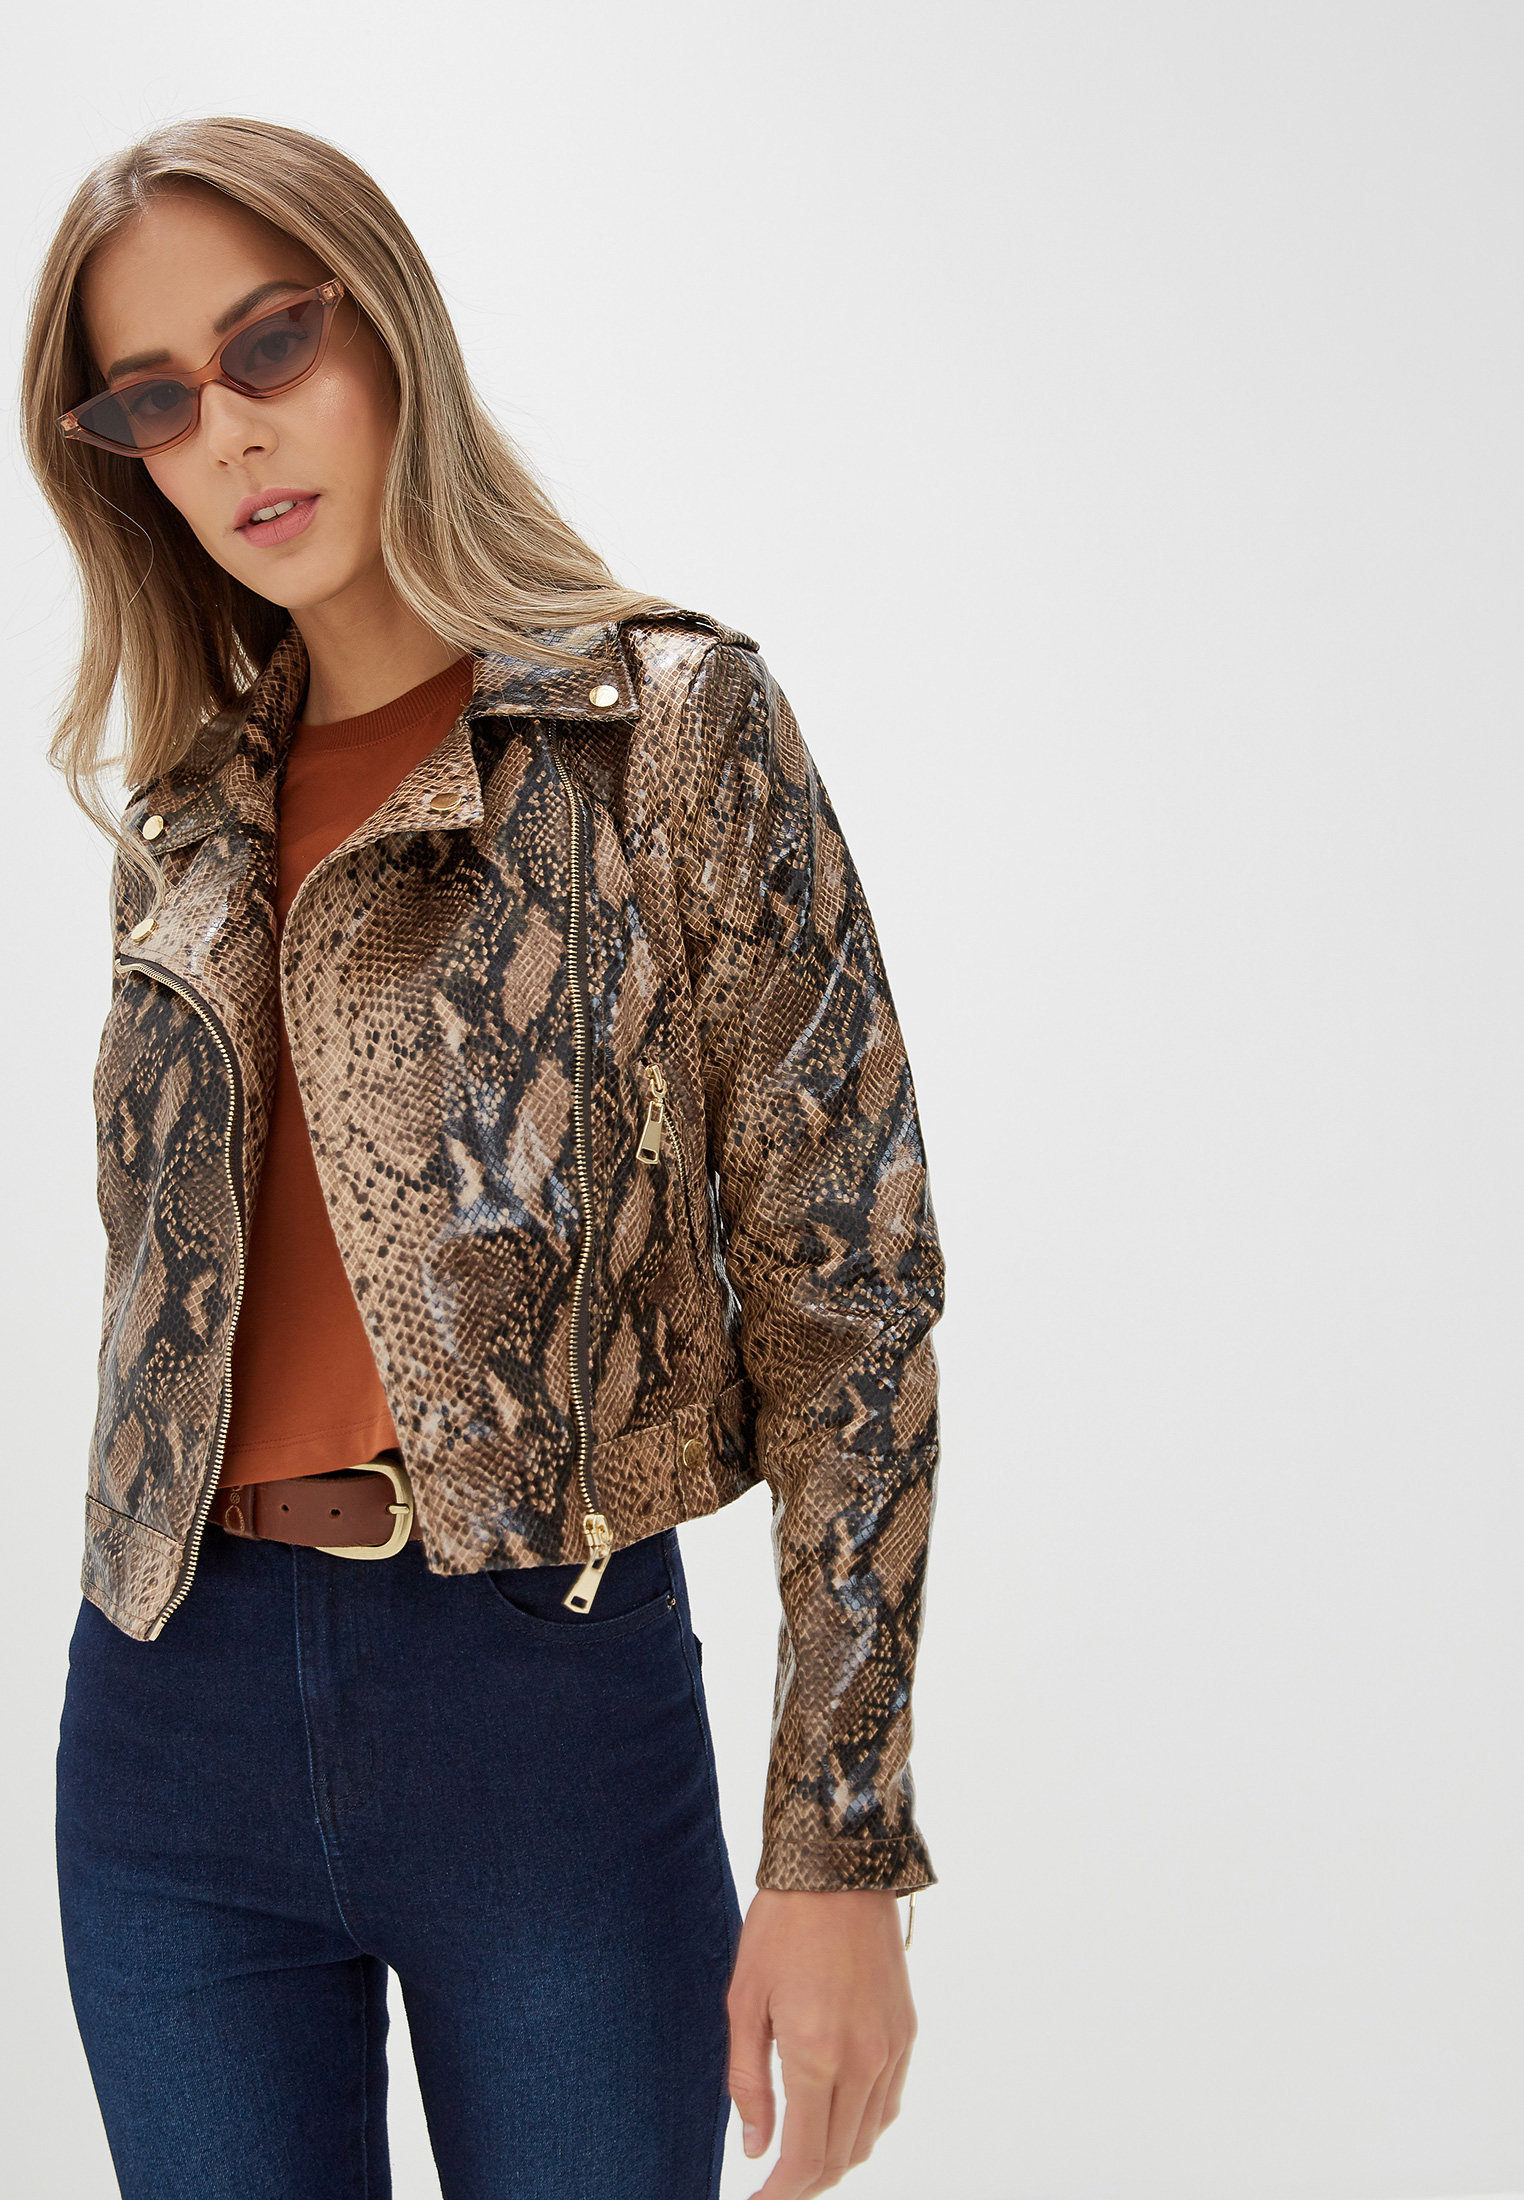 Куртка кожаная, Befree, цвет: коричневый. Артикул: MP002XW0RJO7. Одежда / Верхняя одежда / Косухи